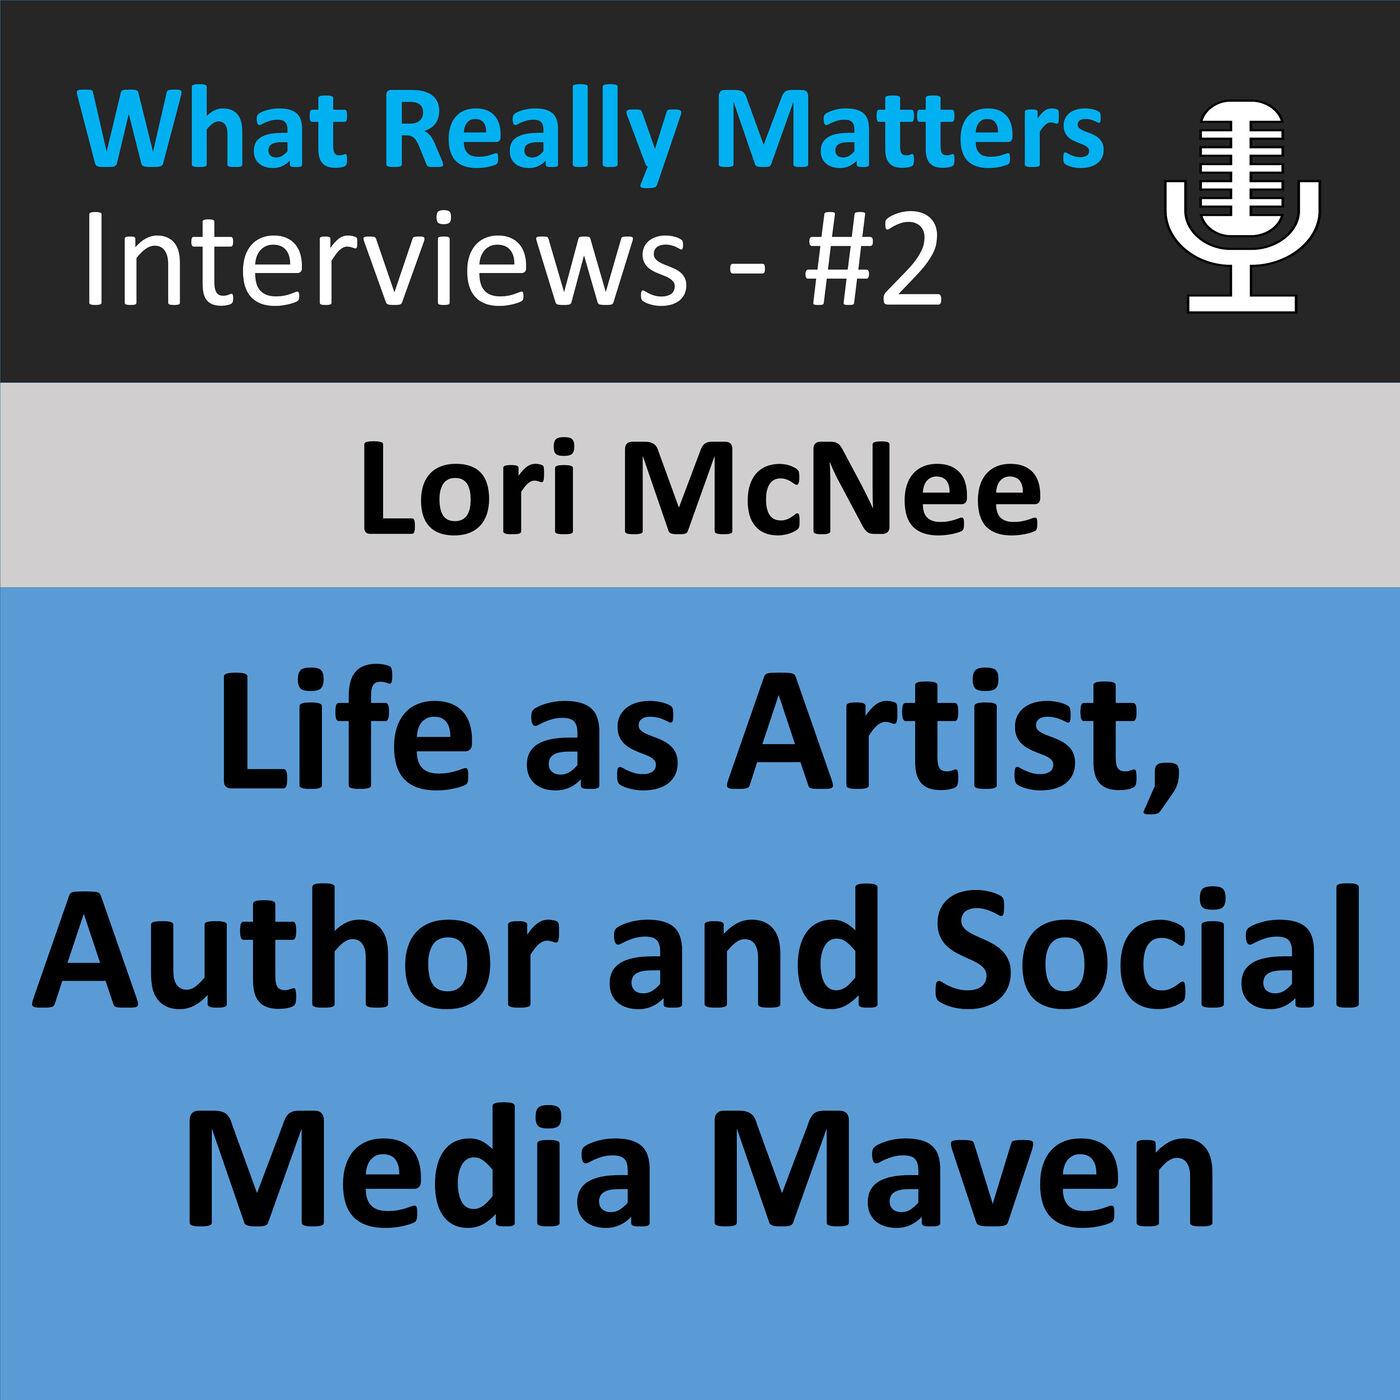 WRMI 002: Interview with Artist, Author & Social Media Maven Lori McNee